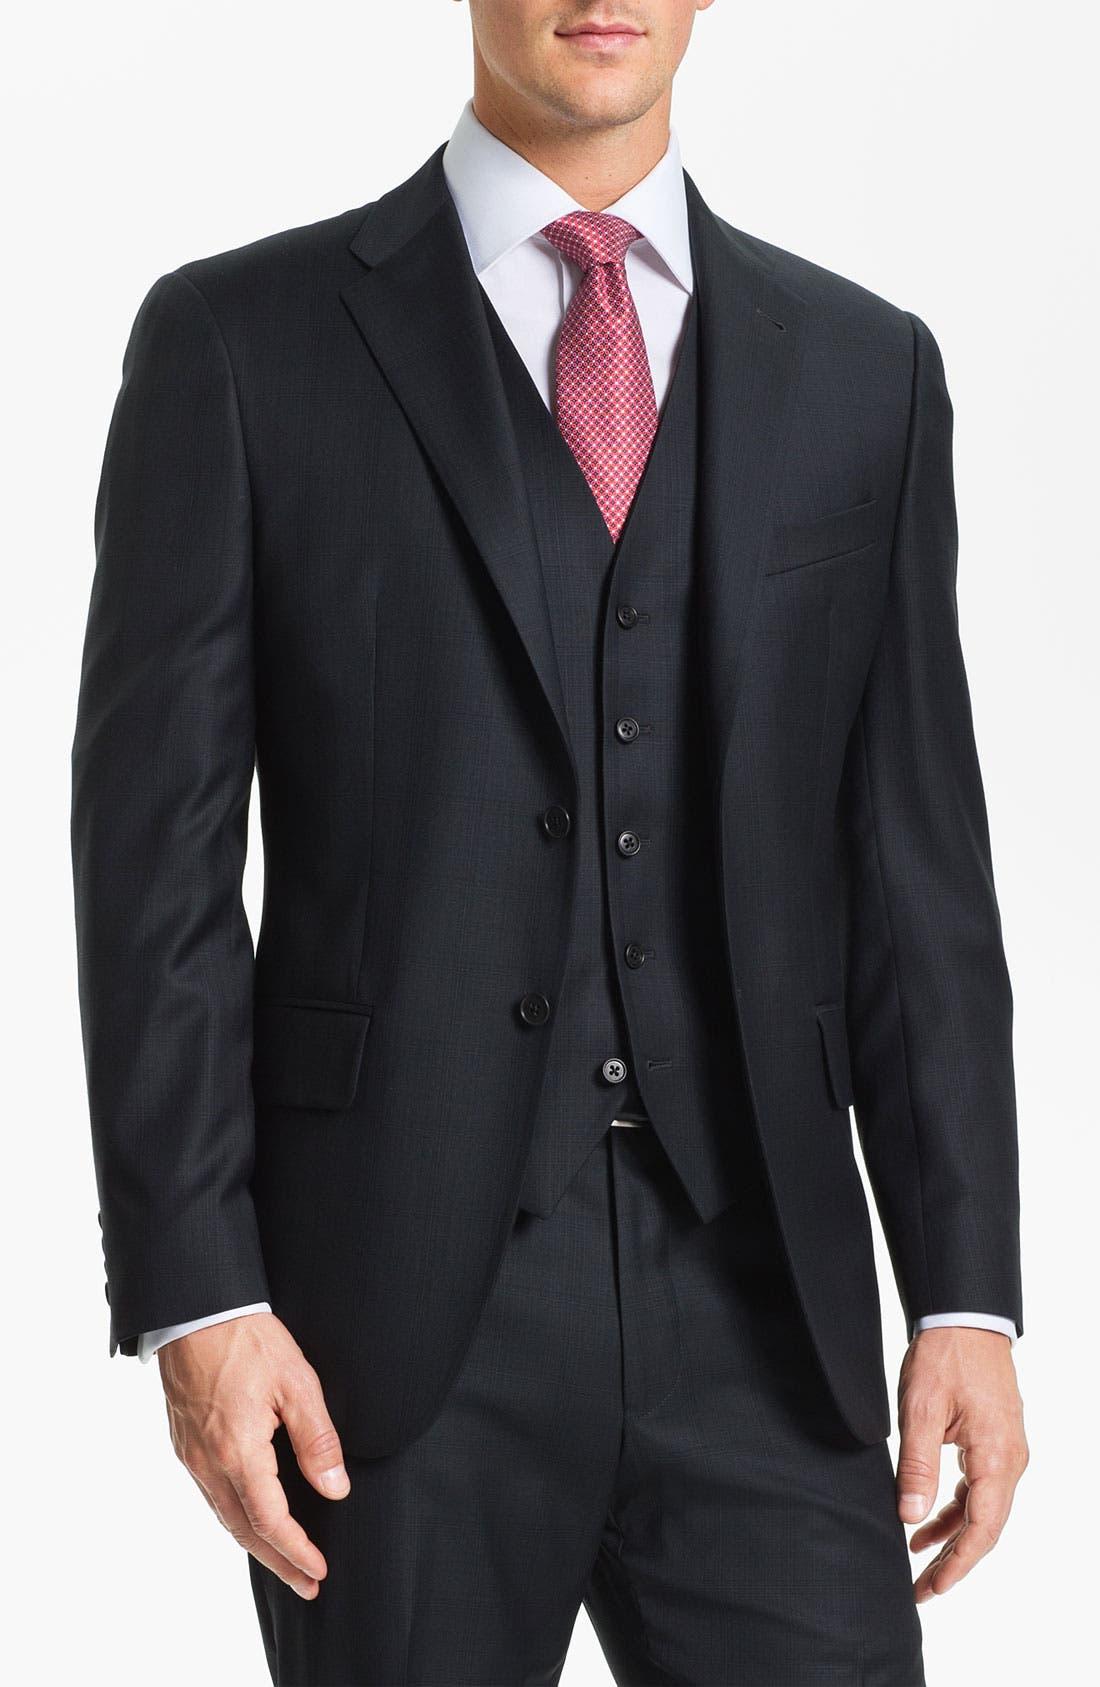 Main Image - Joseph Abboud Trim Fit Three Piece Suit